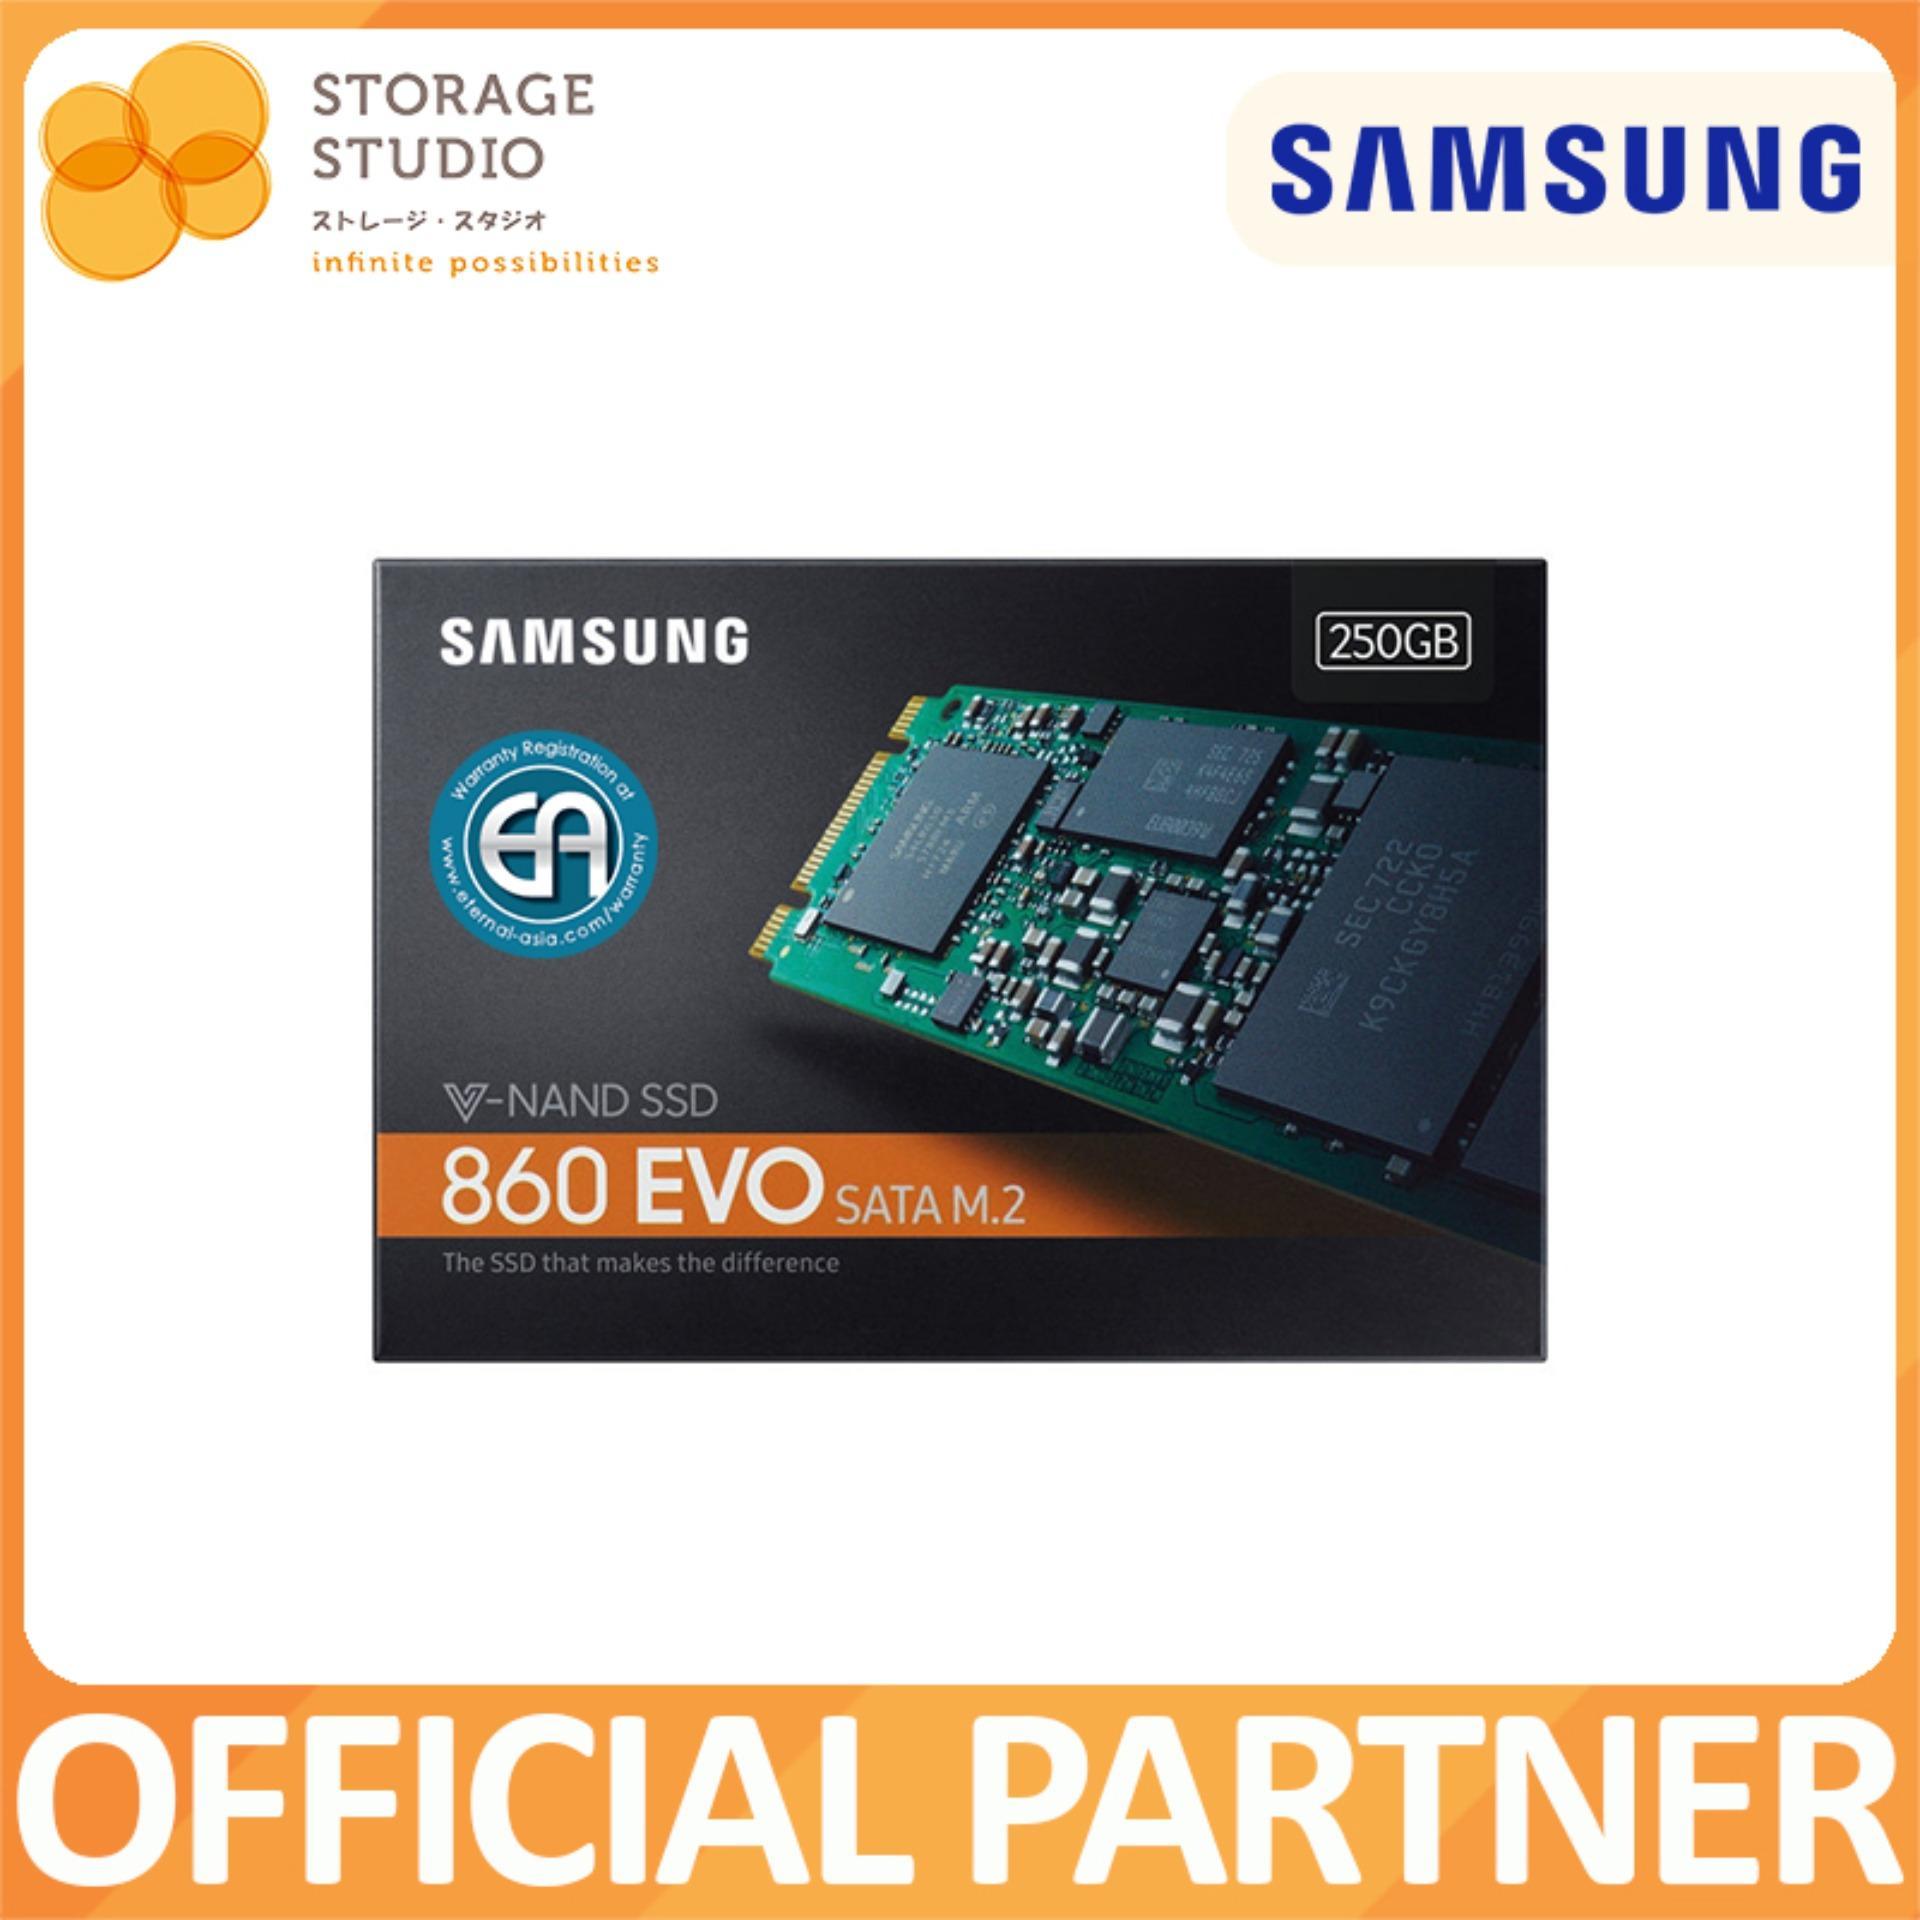 Samsung Ssd 860 Evo Sata Iii 25 Inch 500gb Mz 76e500bw Singapore 250gb M2 N6e250bw